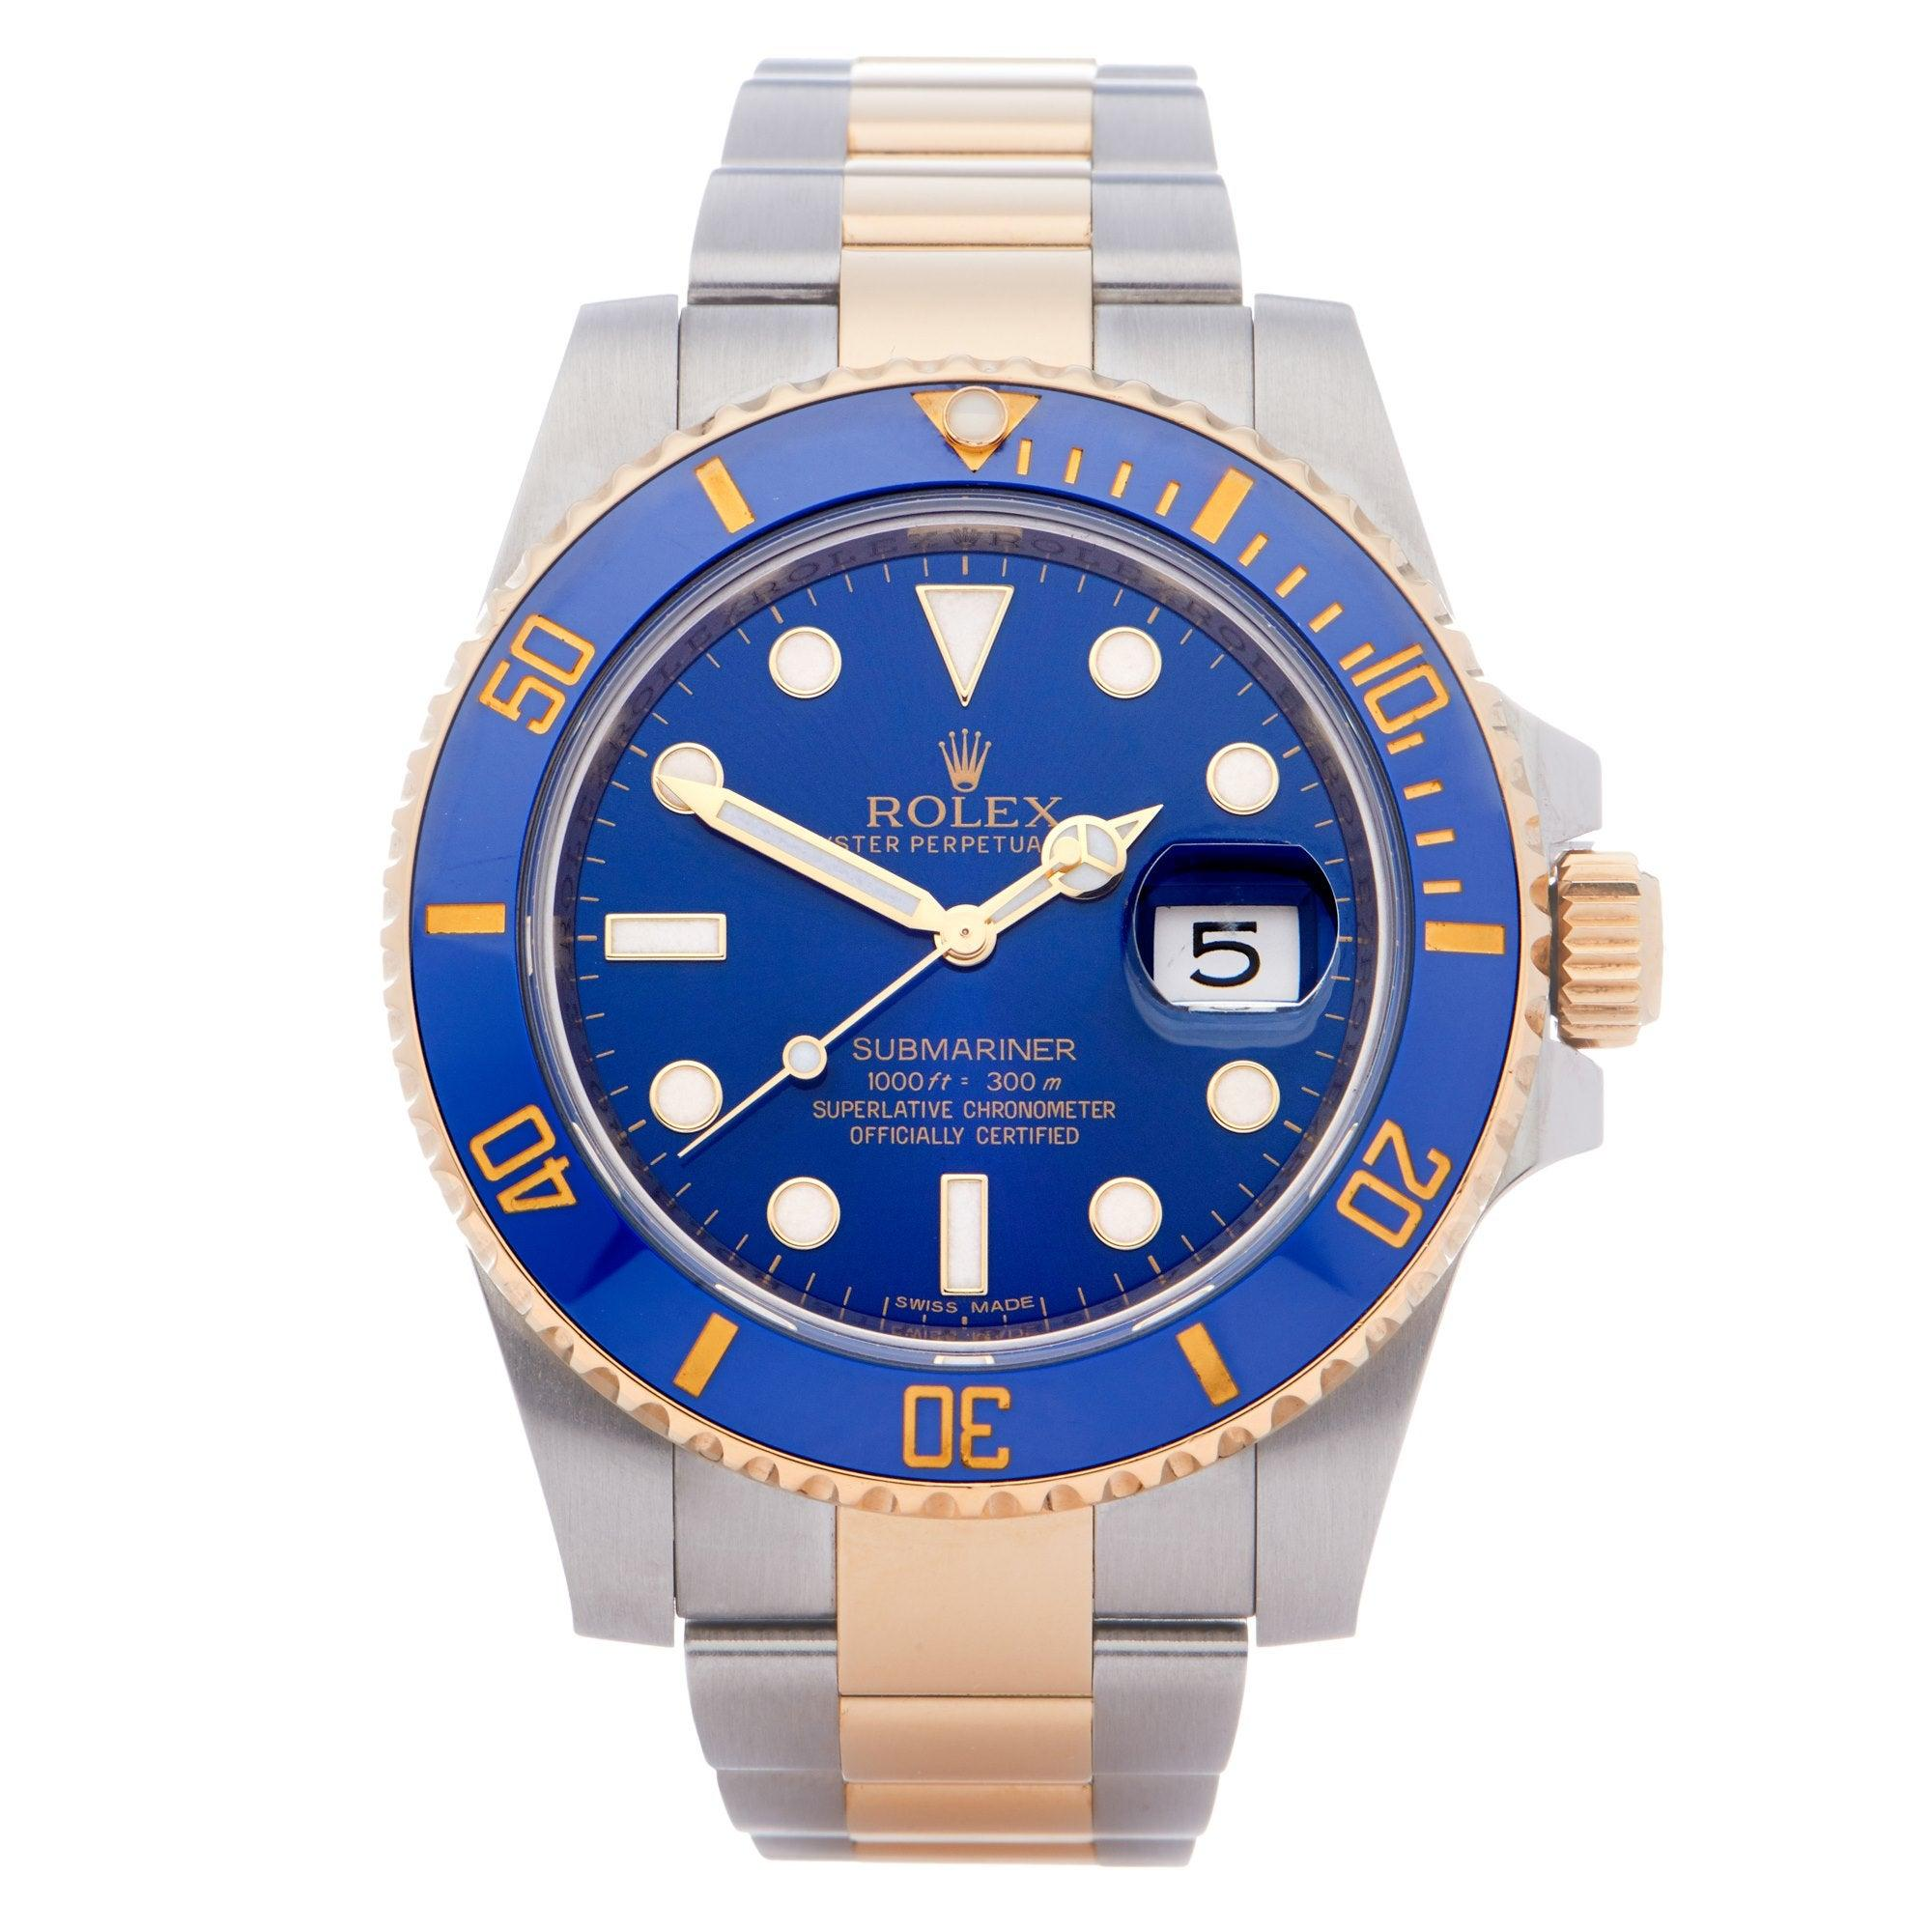 Rolex Submariner Date 116613 Men Yellow Gold & Stainless Steel 18K Watch